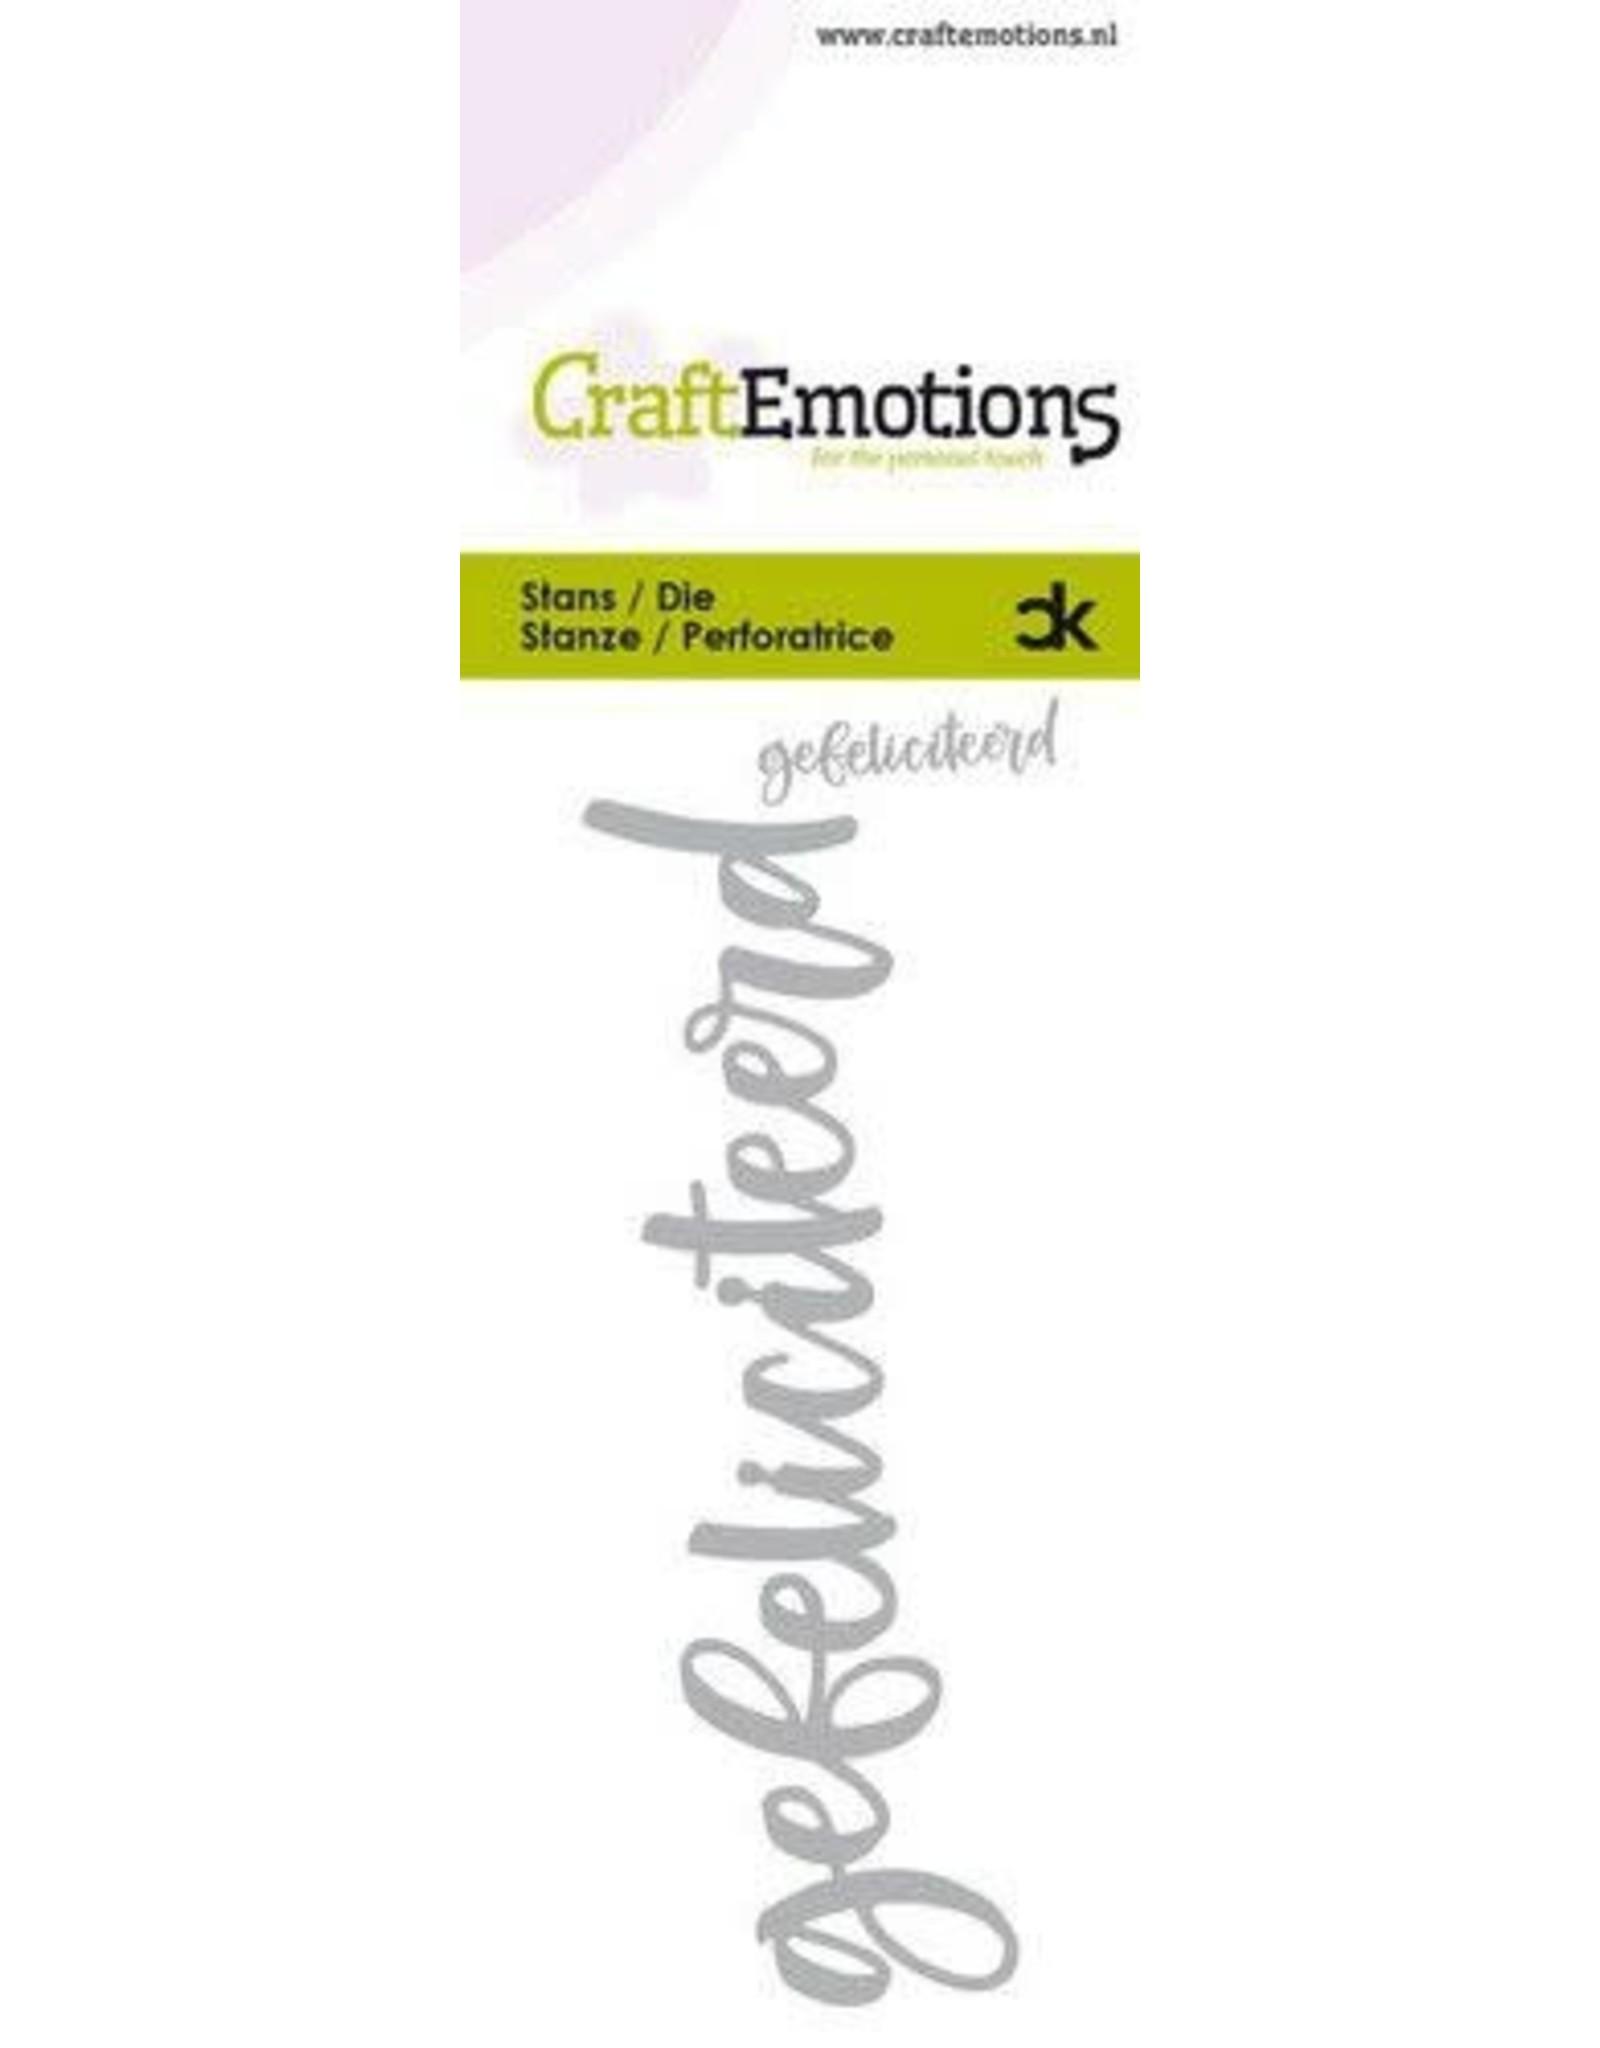 Craft Emotions CraftEmotions Die Handletter - gefeliciteerd (NL) Card 5x10cm Carla Kamphuis